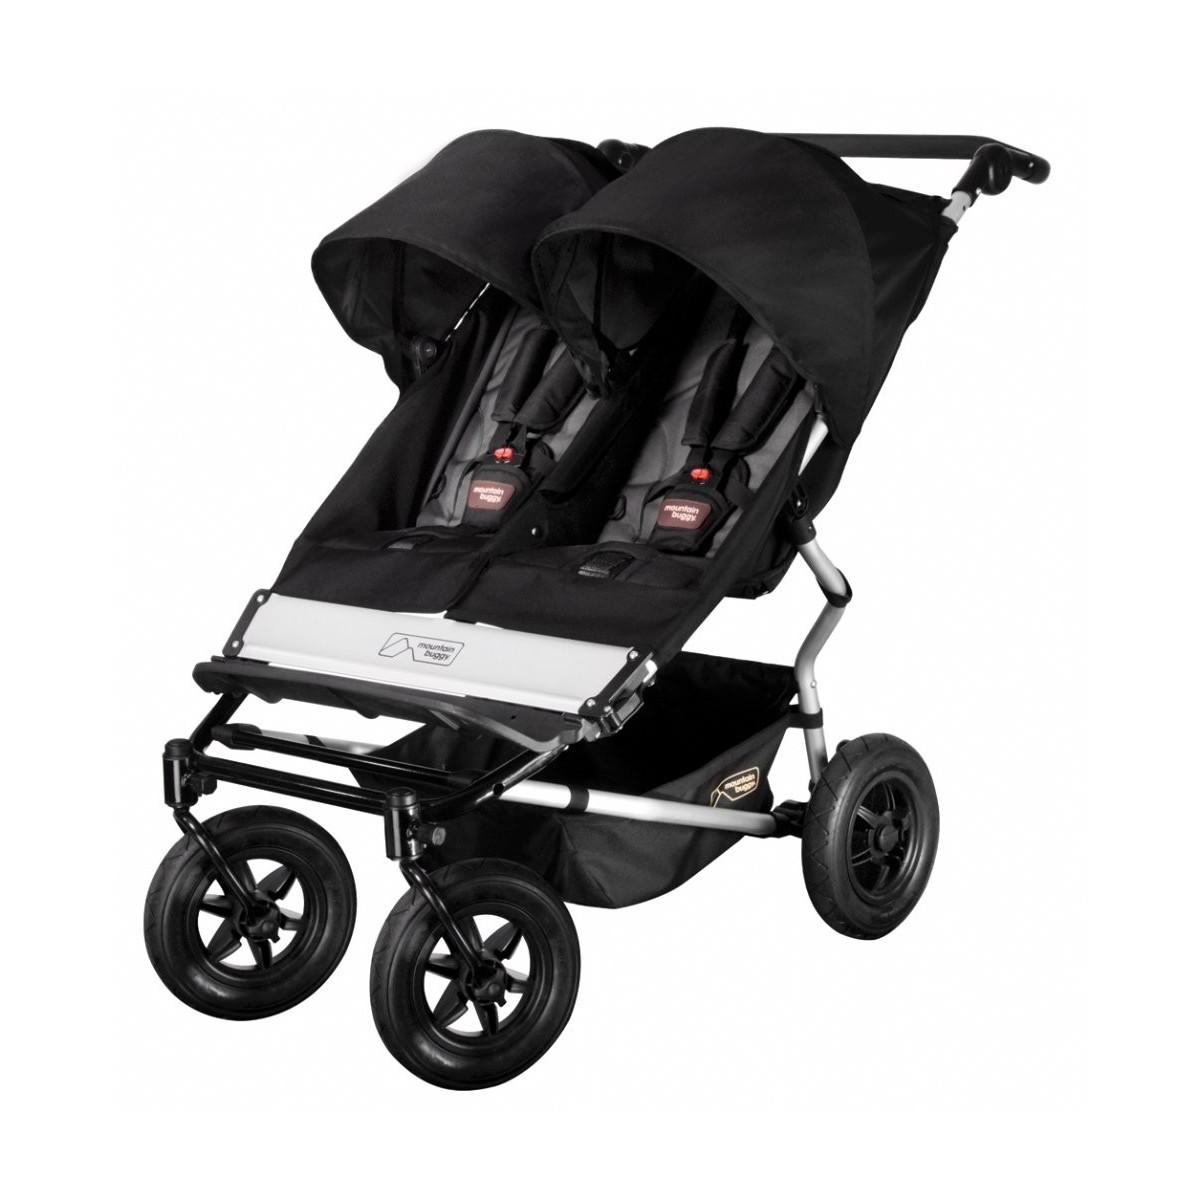 Mis imprescindibles gemelares i carritos de beb baratos for Carritos de bebe maclaren